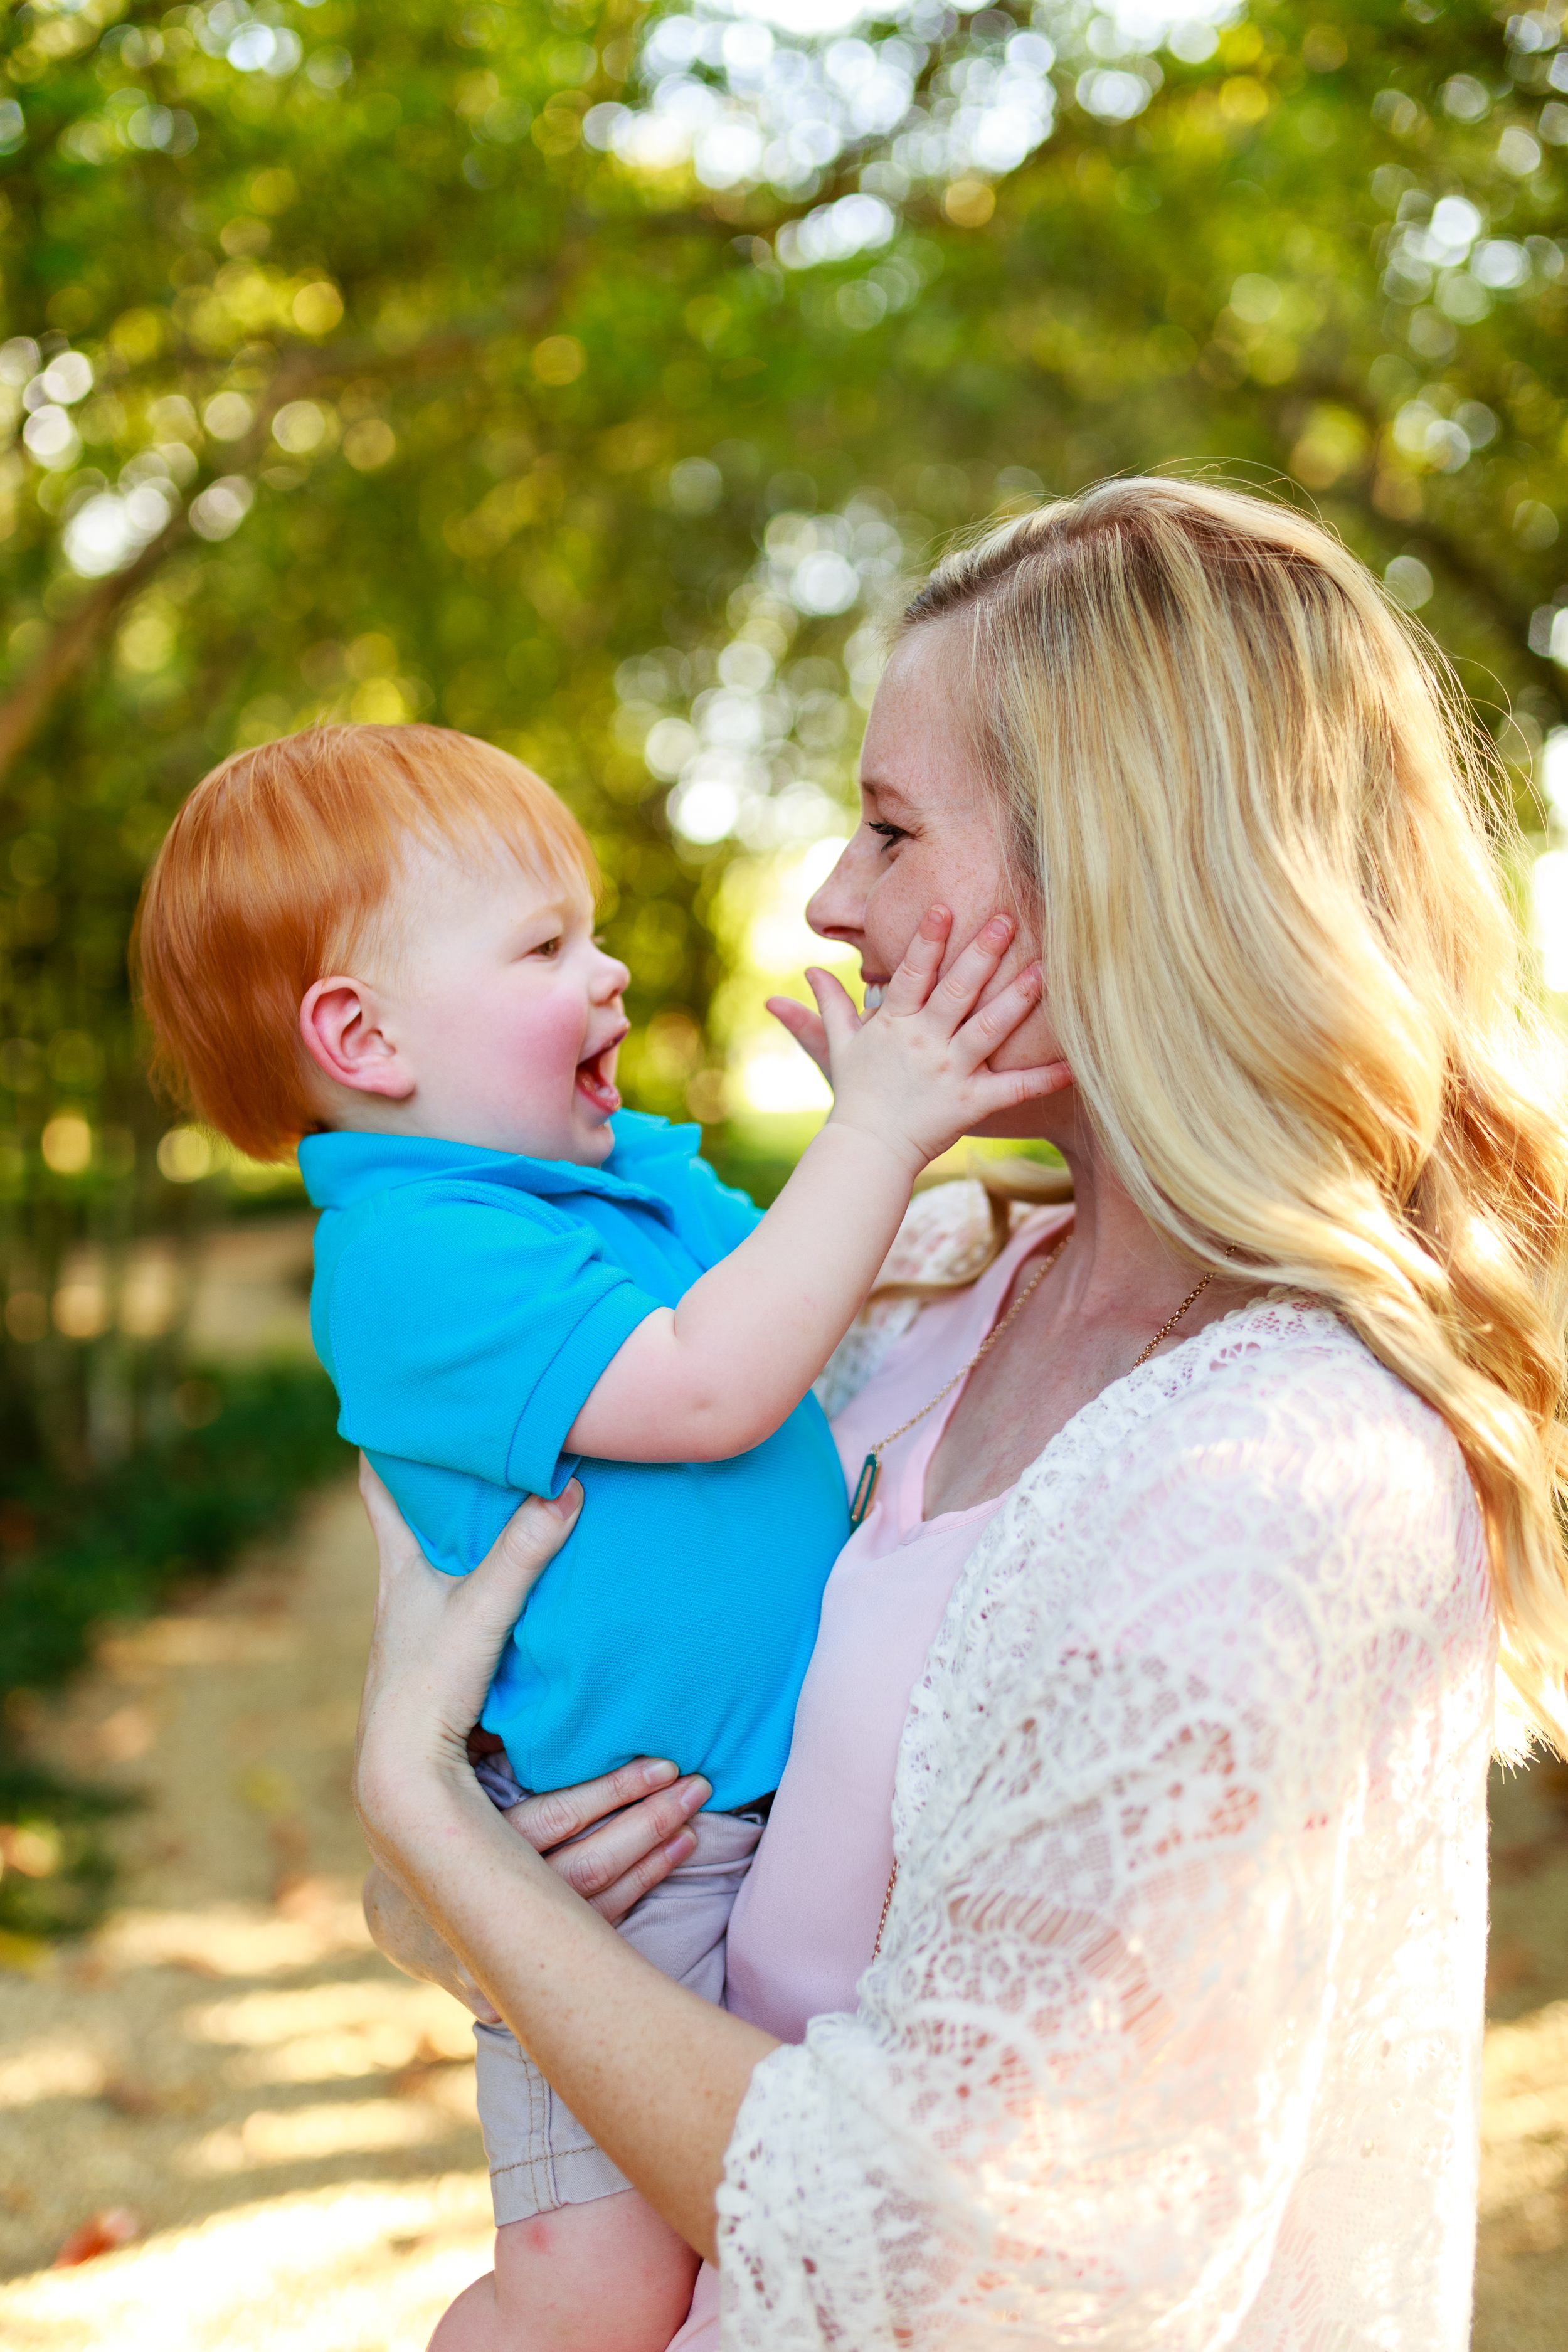 Family-child-portrait-lafayette-broussard-youngsville-photographer-11.jpg